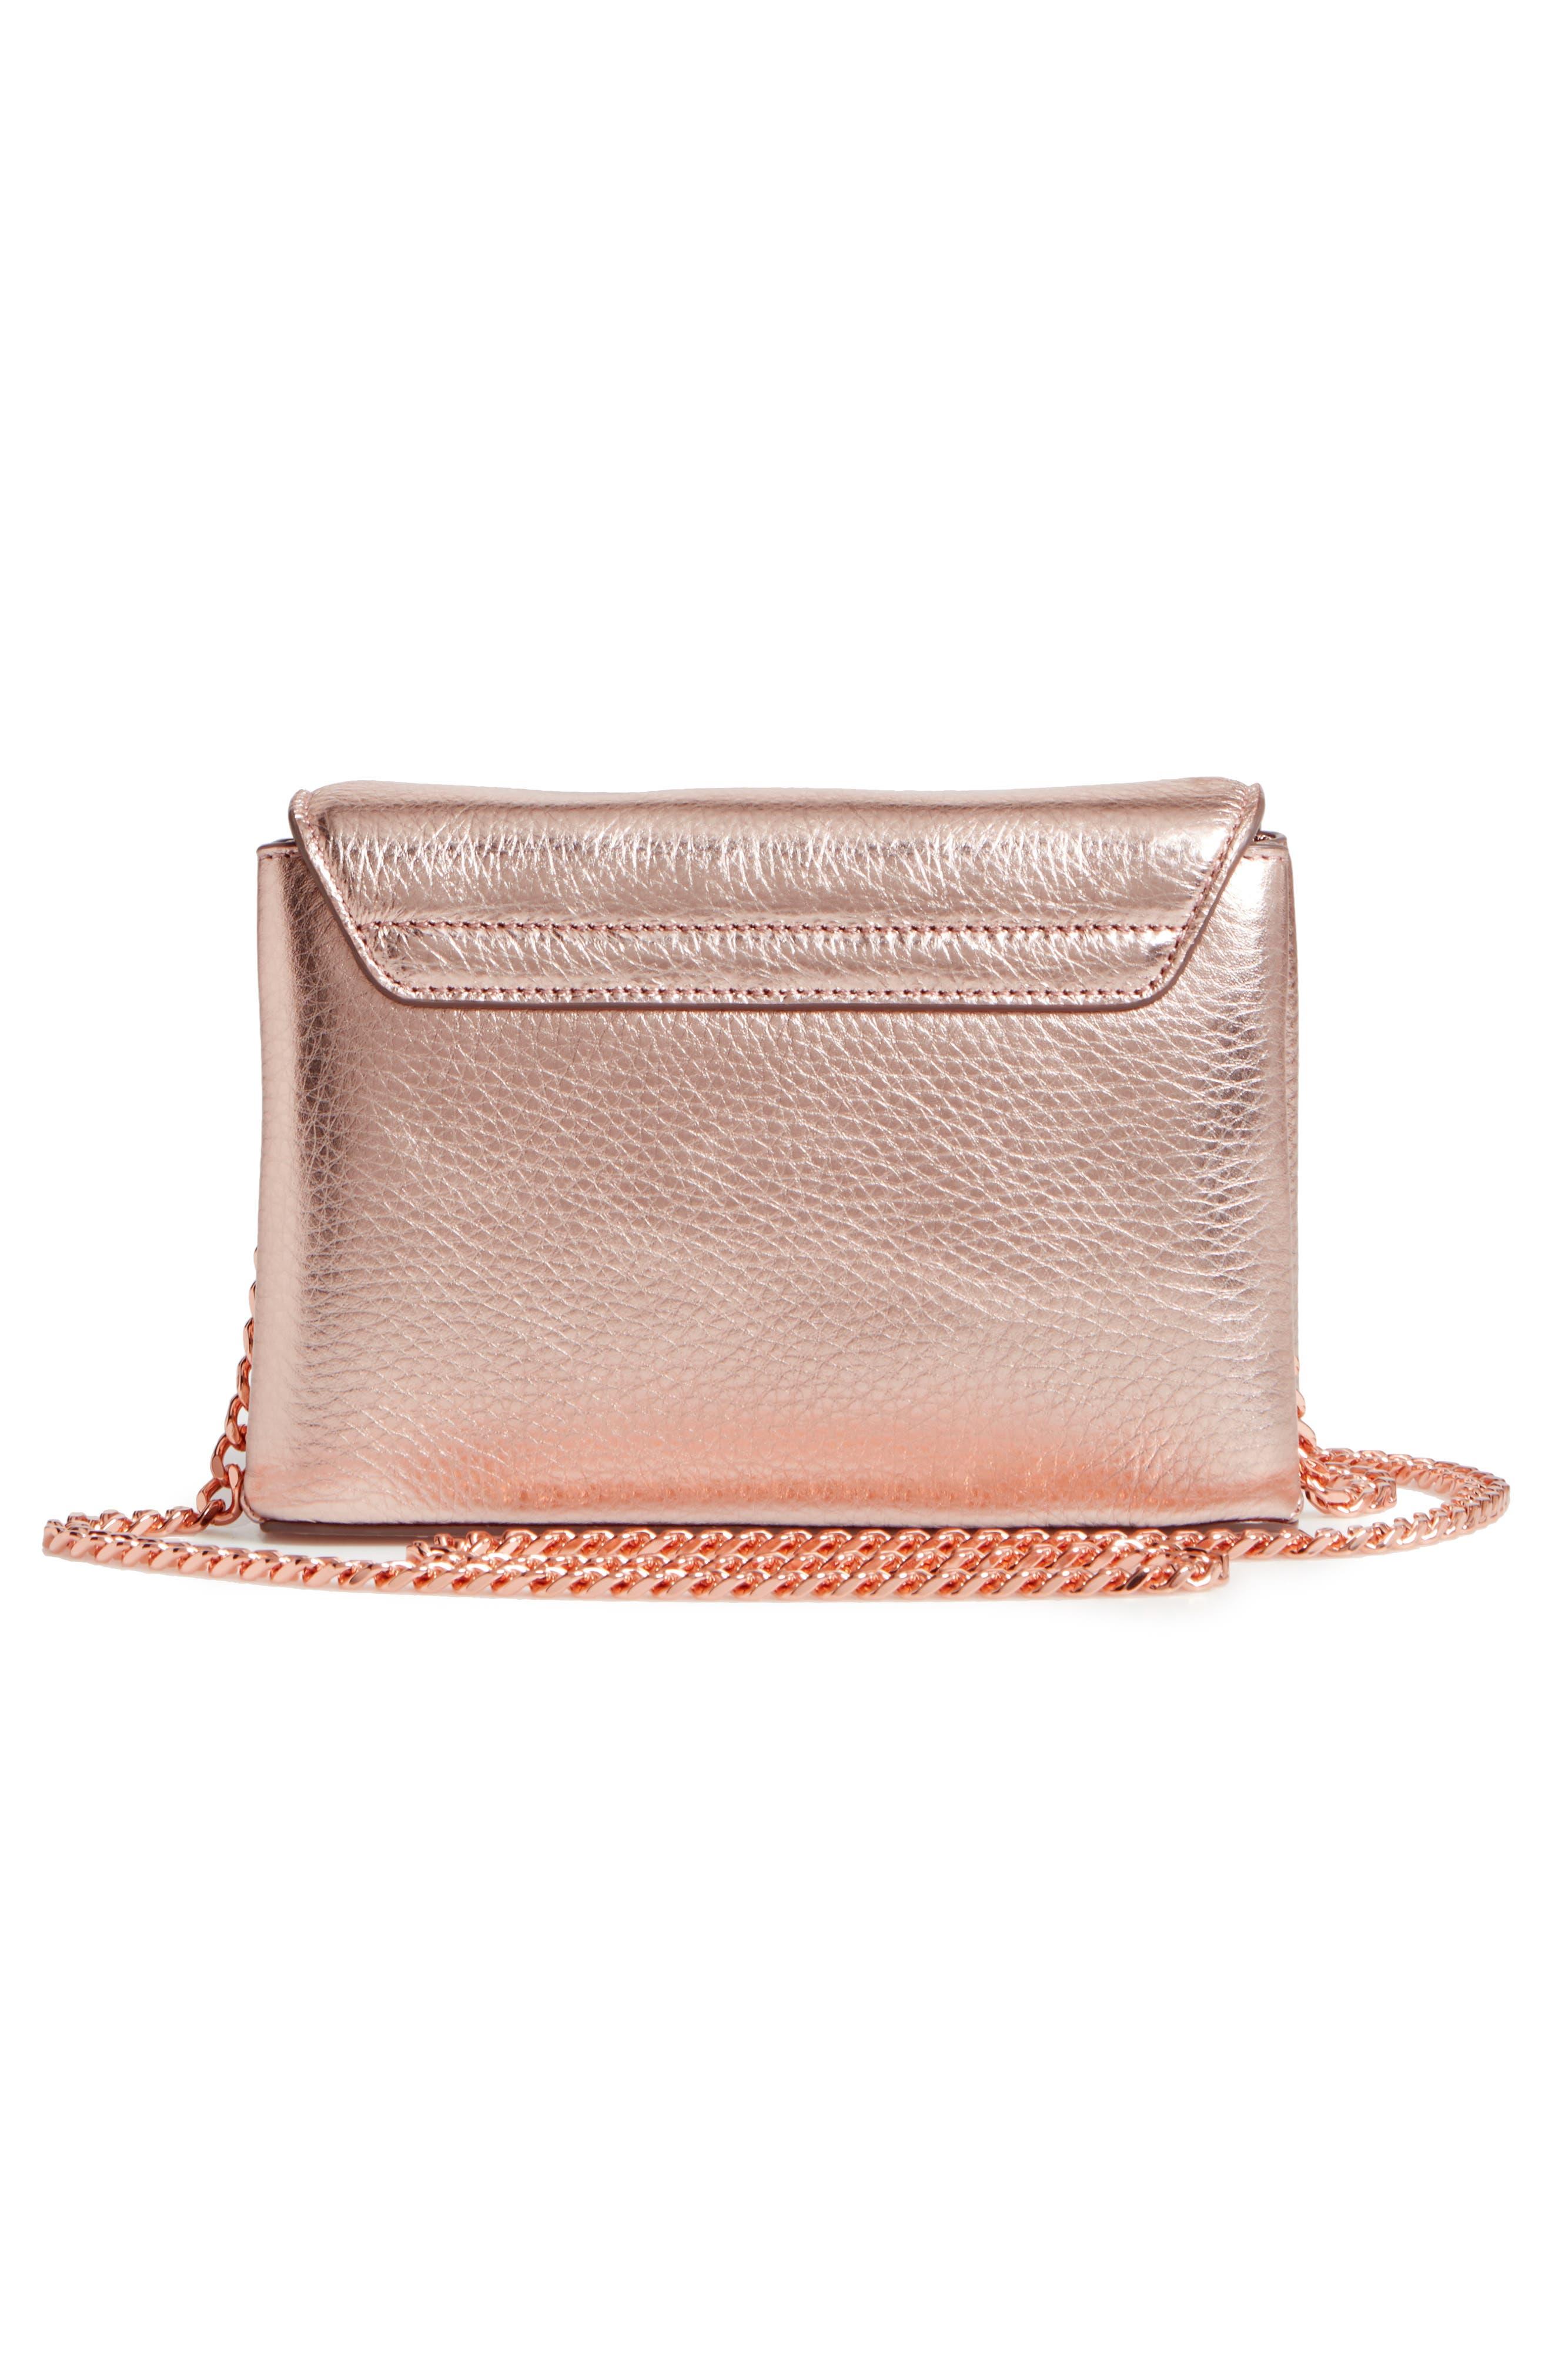 Alternate Image 3  - Ted Baker London Lupiin Metallic Leather Crossbody Bag